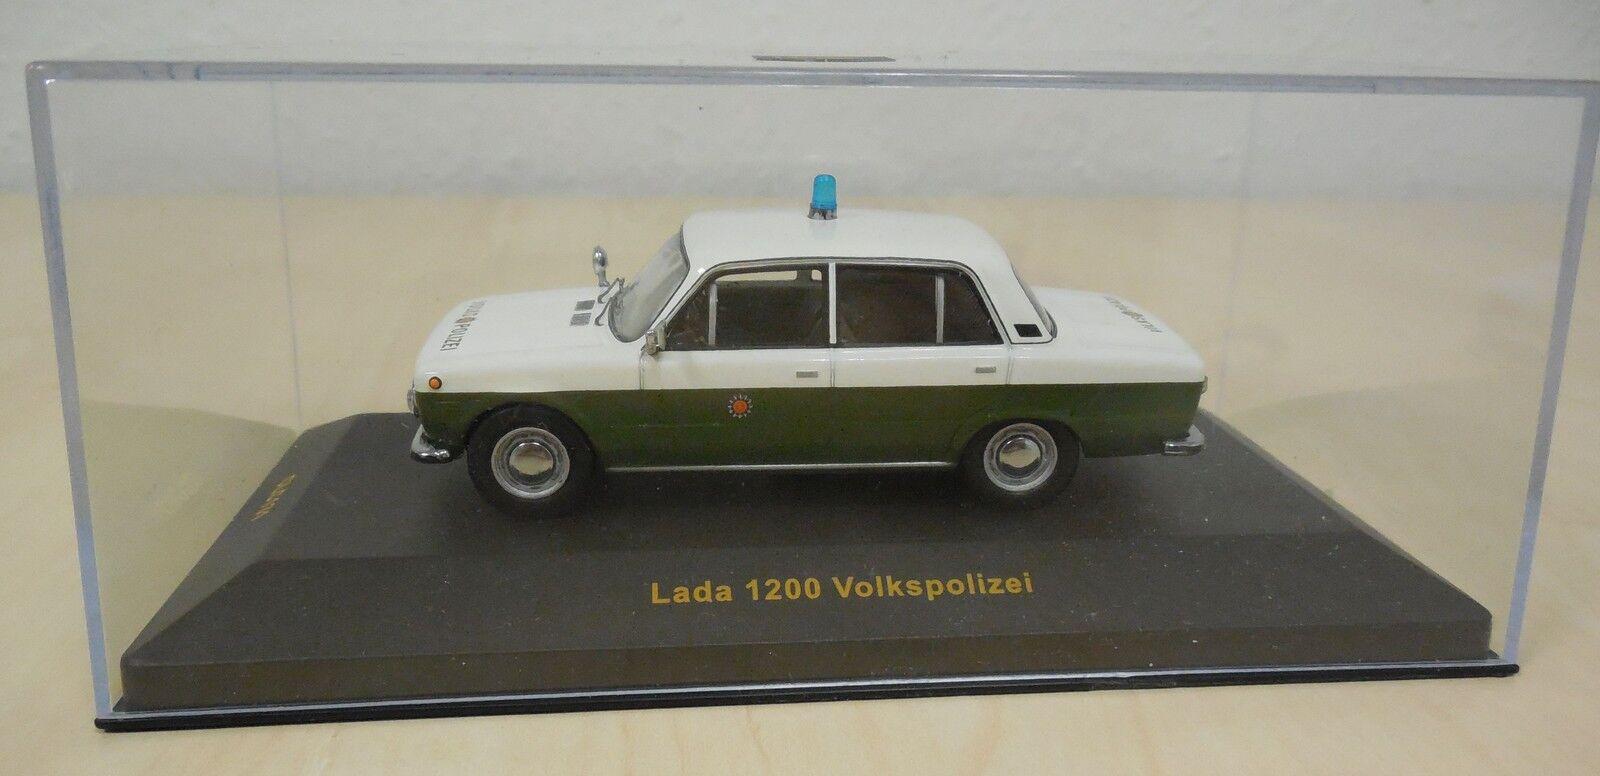 Lada 1200 Volkspolizei 1 43 IXO IXO IXO OVP VoPo-Lada von